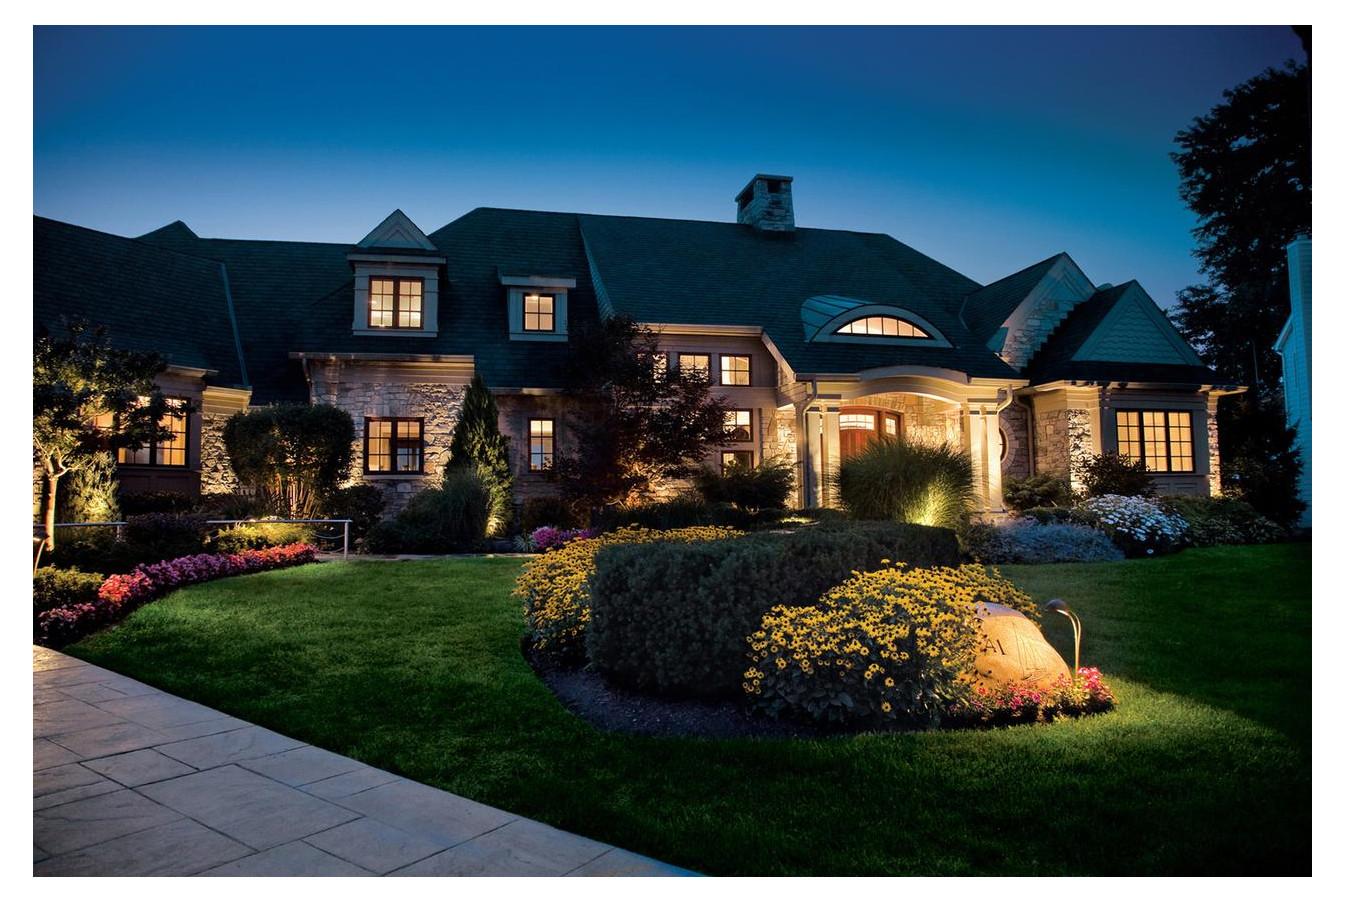 Best ideas about DIY Landscape Lighting . Save or Pin Best Buy plete Premium Landscape Lighting DIY Kits Now.